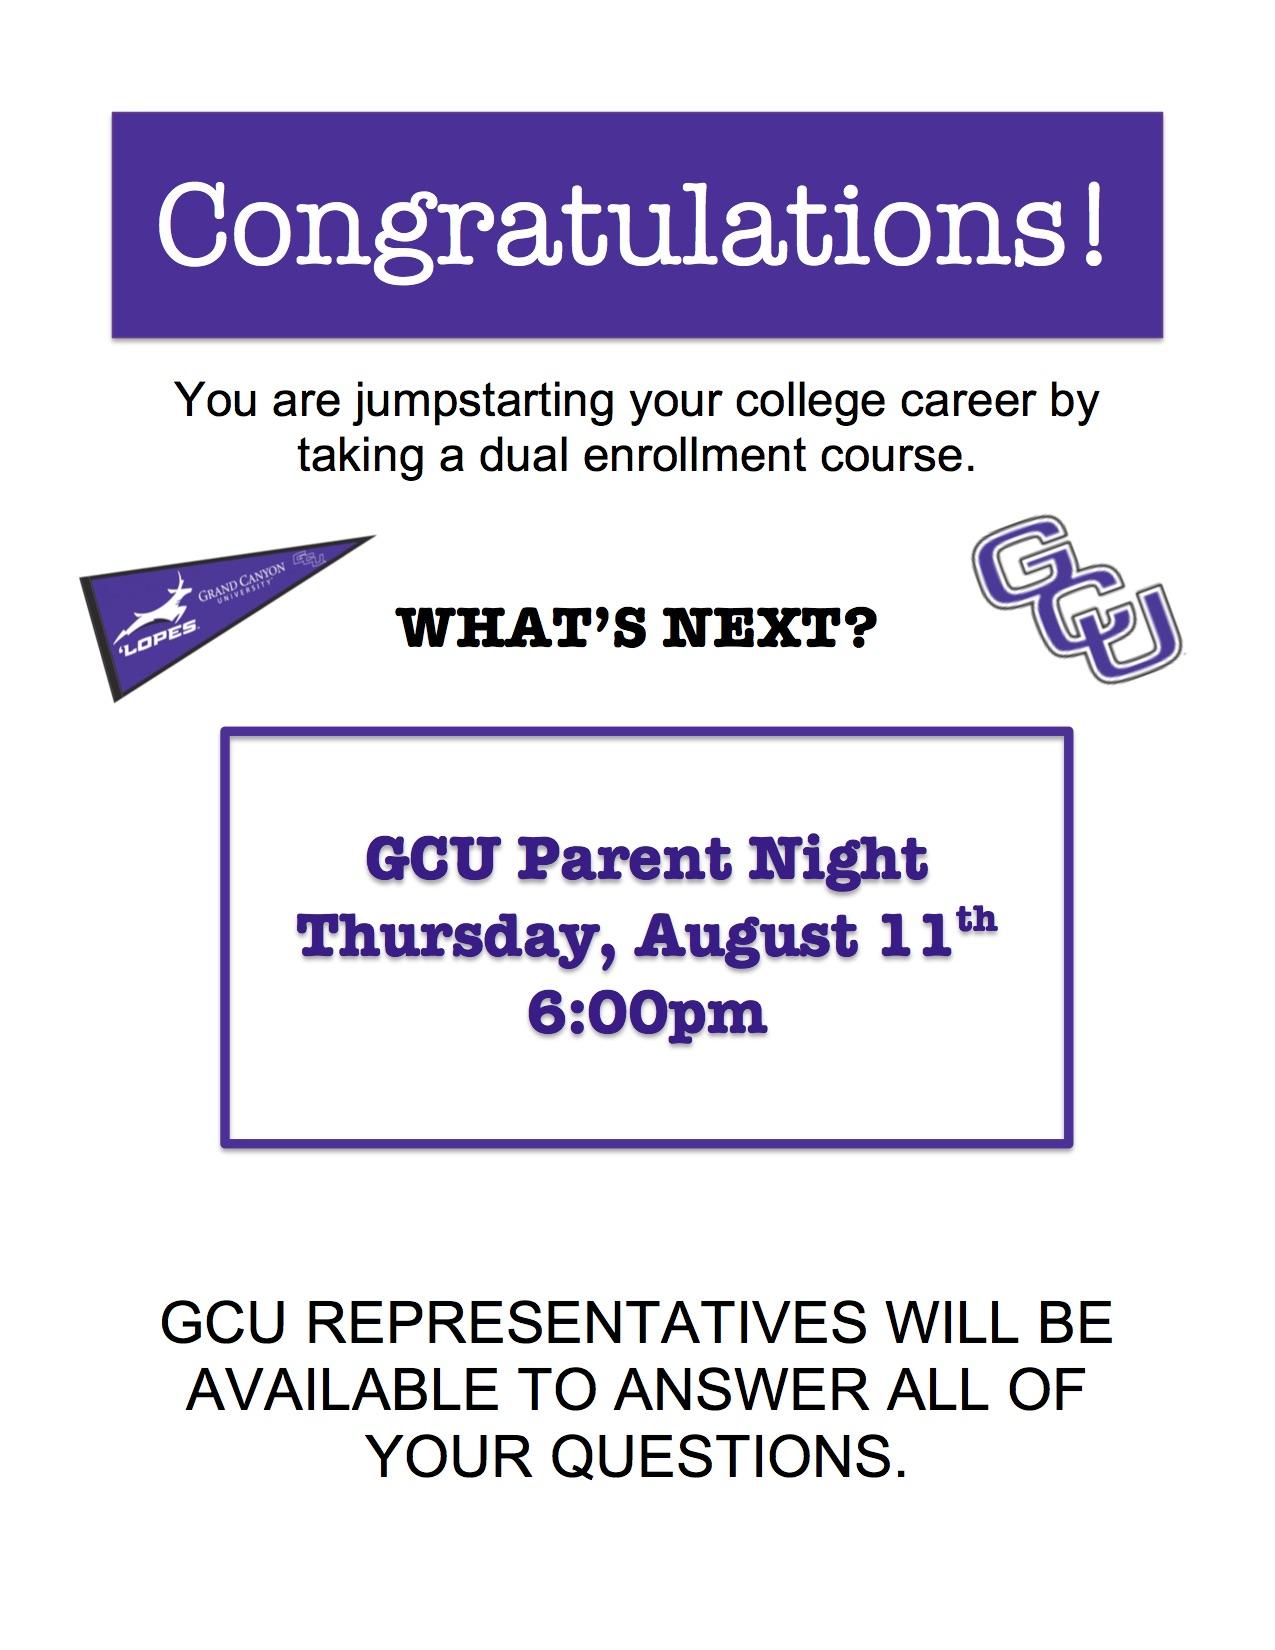 Gcu Parent Night Within Gcu 2021 2020 Academic Calendar